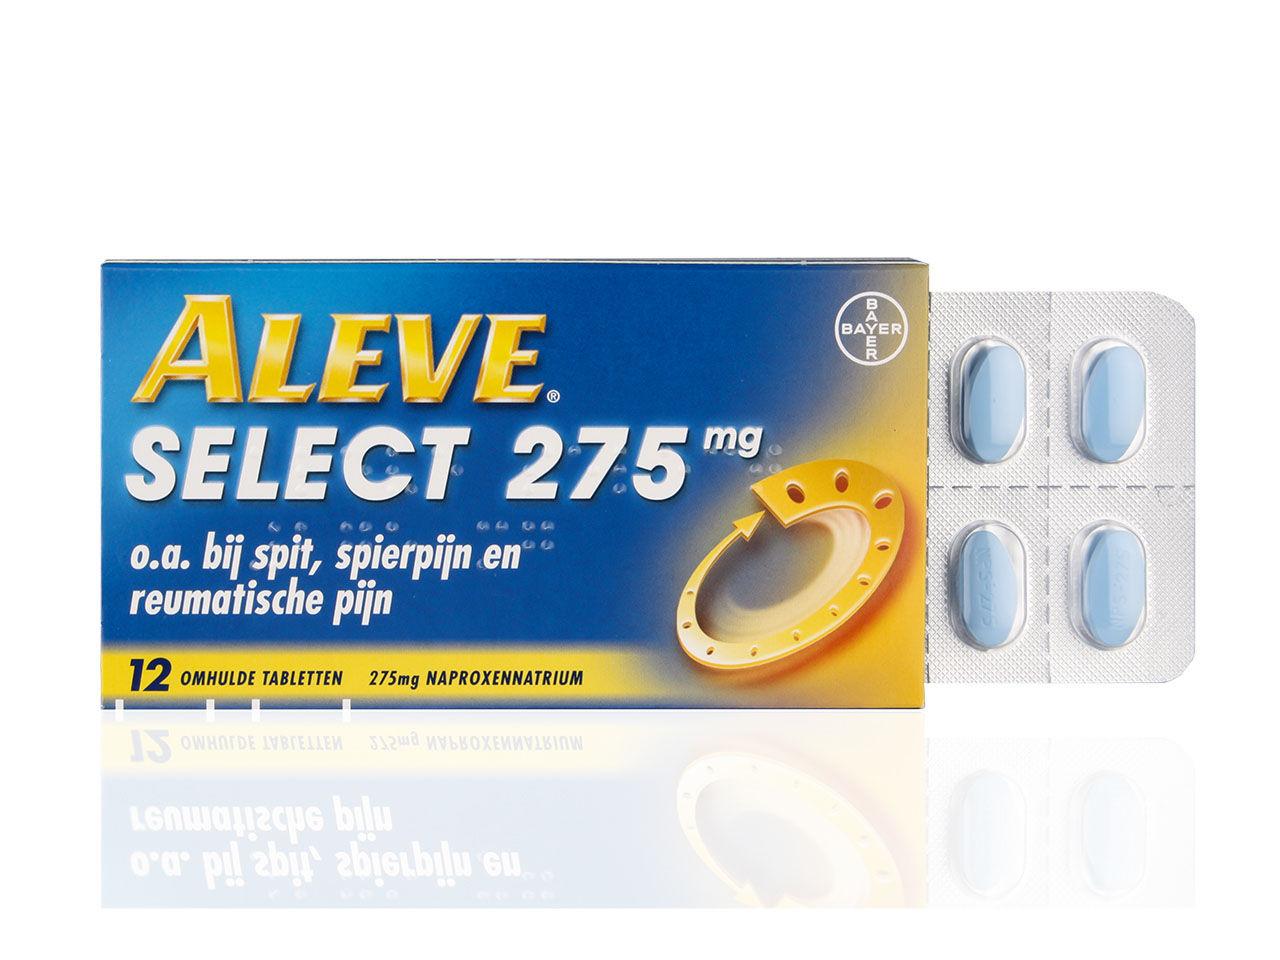 Aleve Select Tablet 275mg